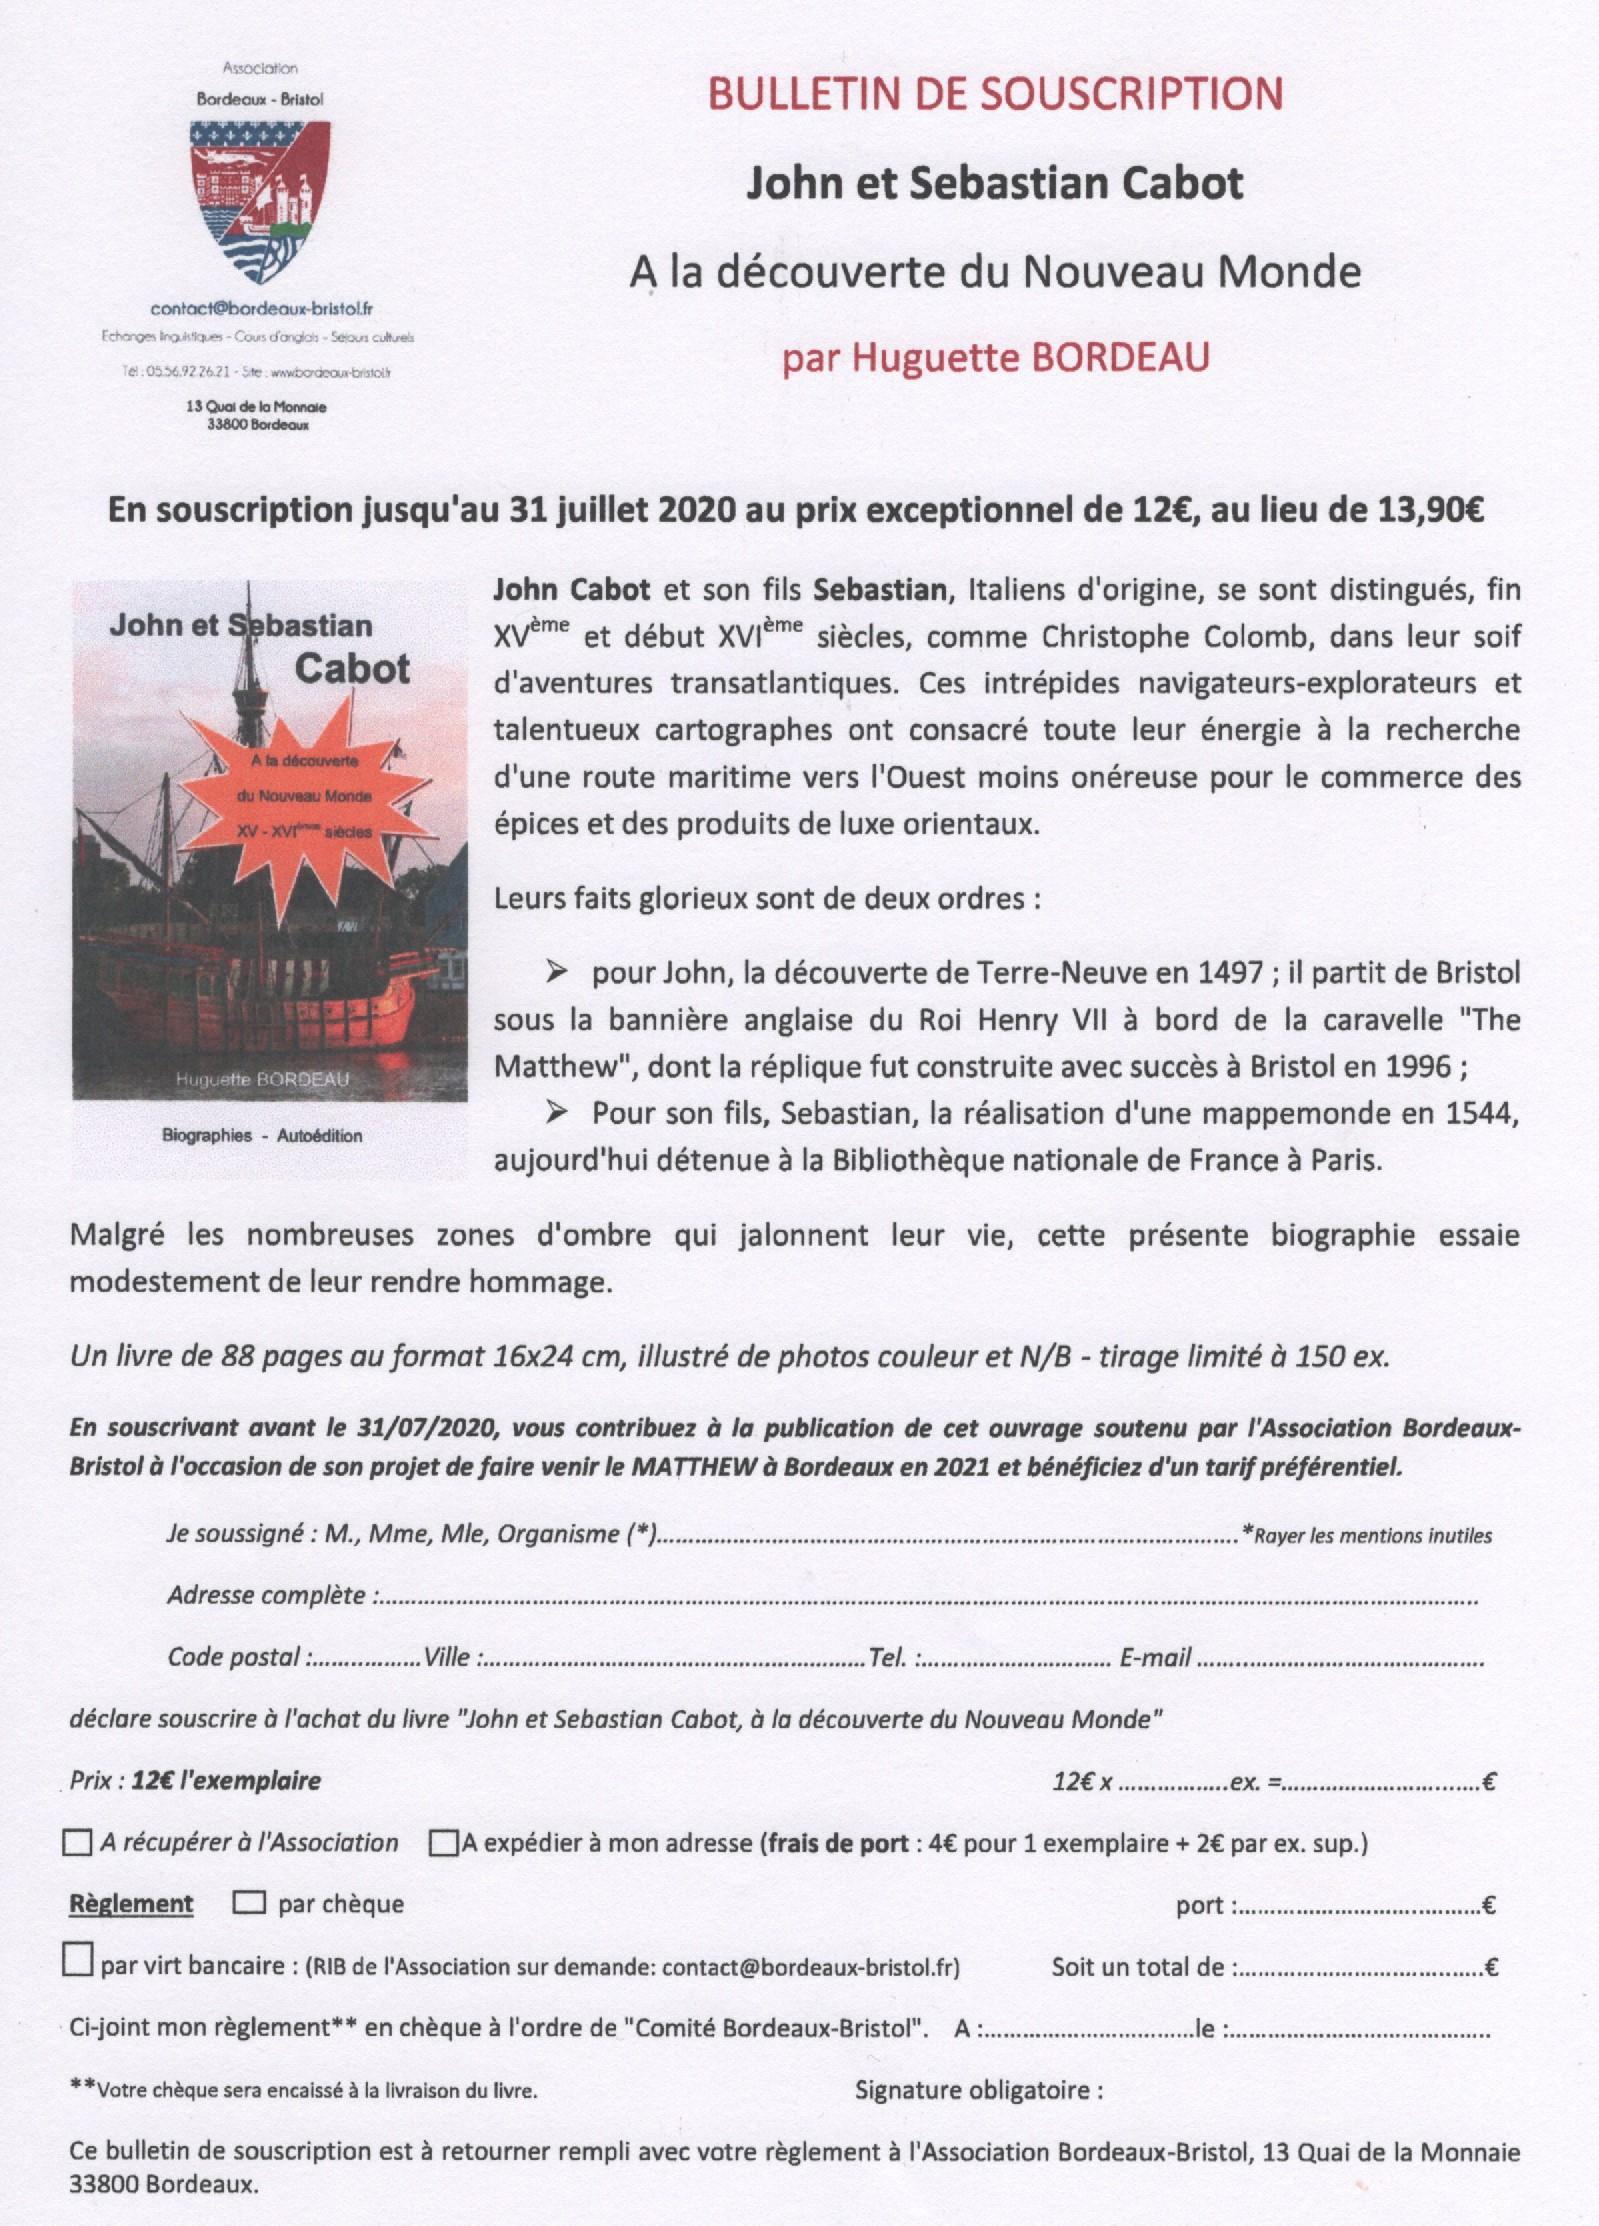 BULLETIN DE SOUSCRIPTION livre John et Sebastian Cabot